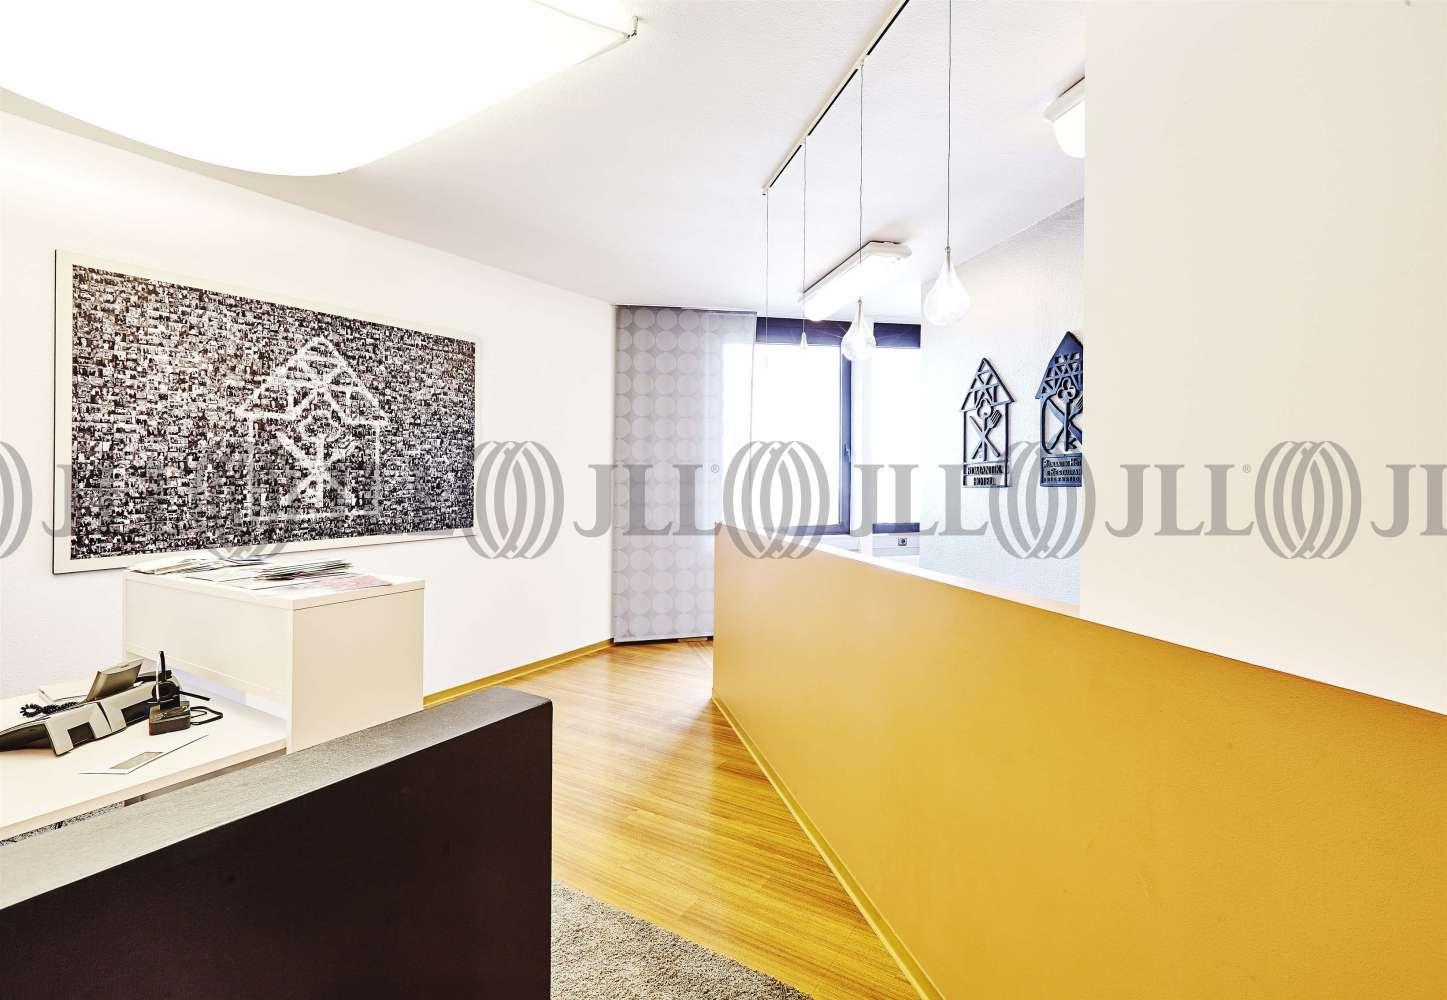 Büros Frankfurt am main, 60528 - Büro - Frankfurt am Main, Niederrad - F0262 - 10010830